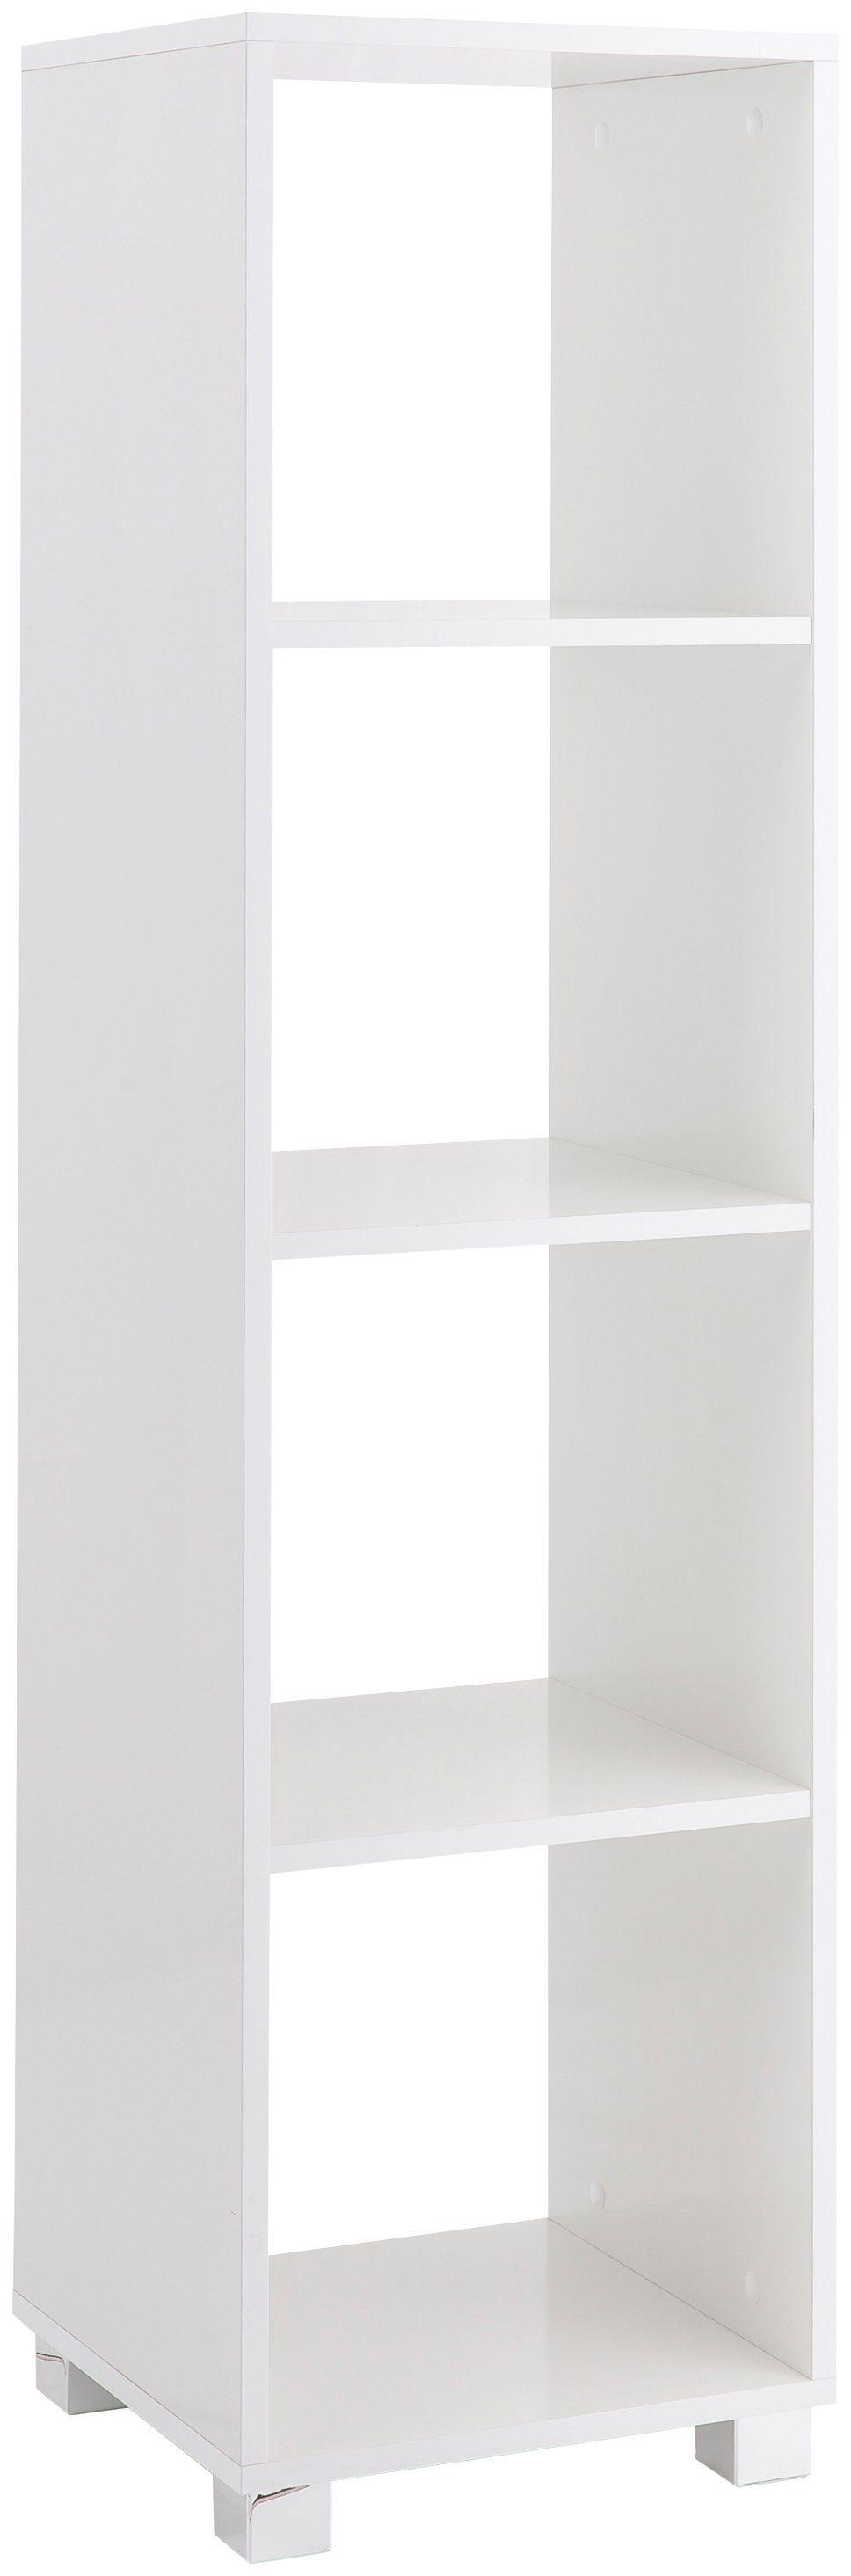 SCHILDMEYER Badregal »Lena«, Breite 36 cm